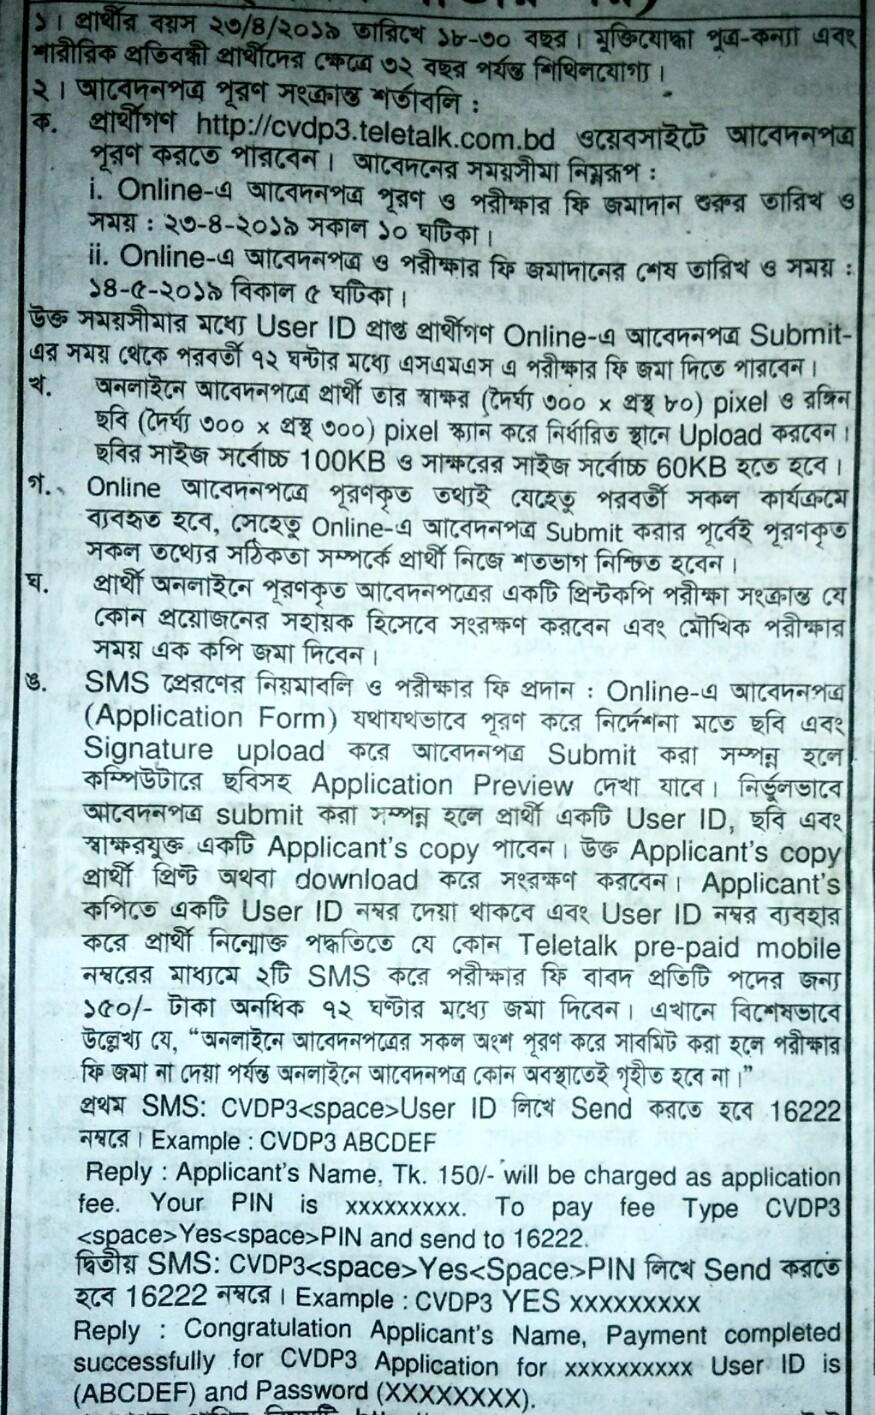 Rural Development and Co-operative Department job circular 2019. পল্লী উন্নয়ন ও সমবায় বিভাগ নিয়োগ বিজ্ঞপ্তি ২০১৯